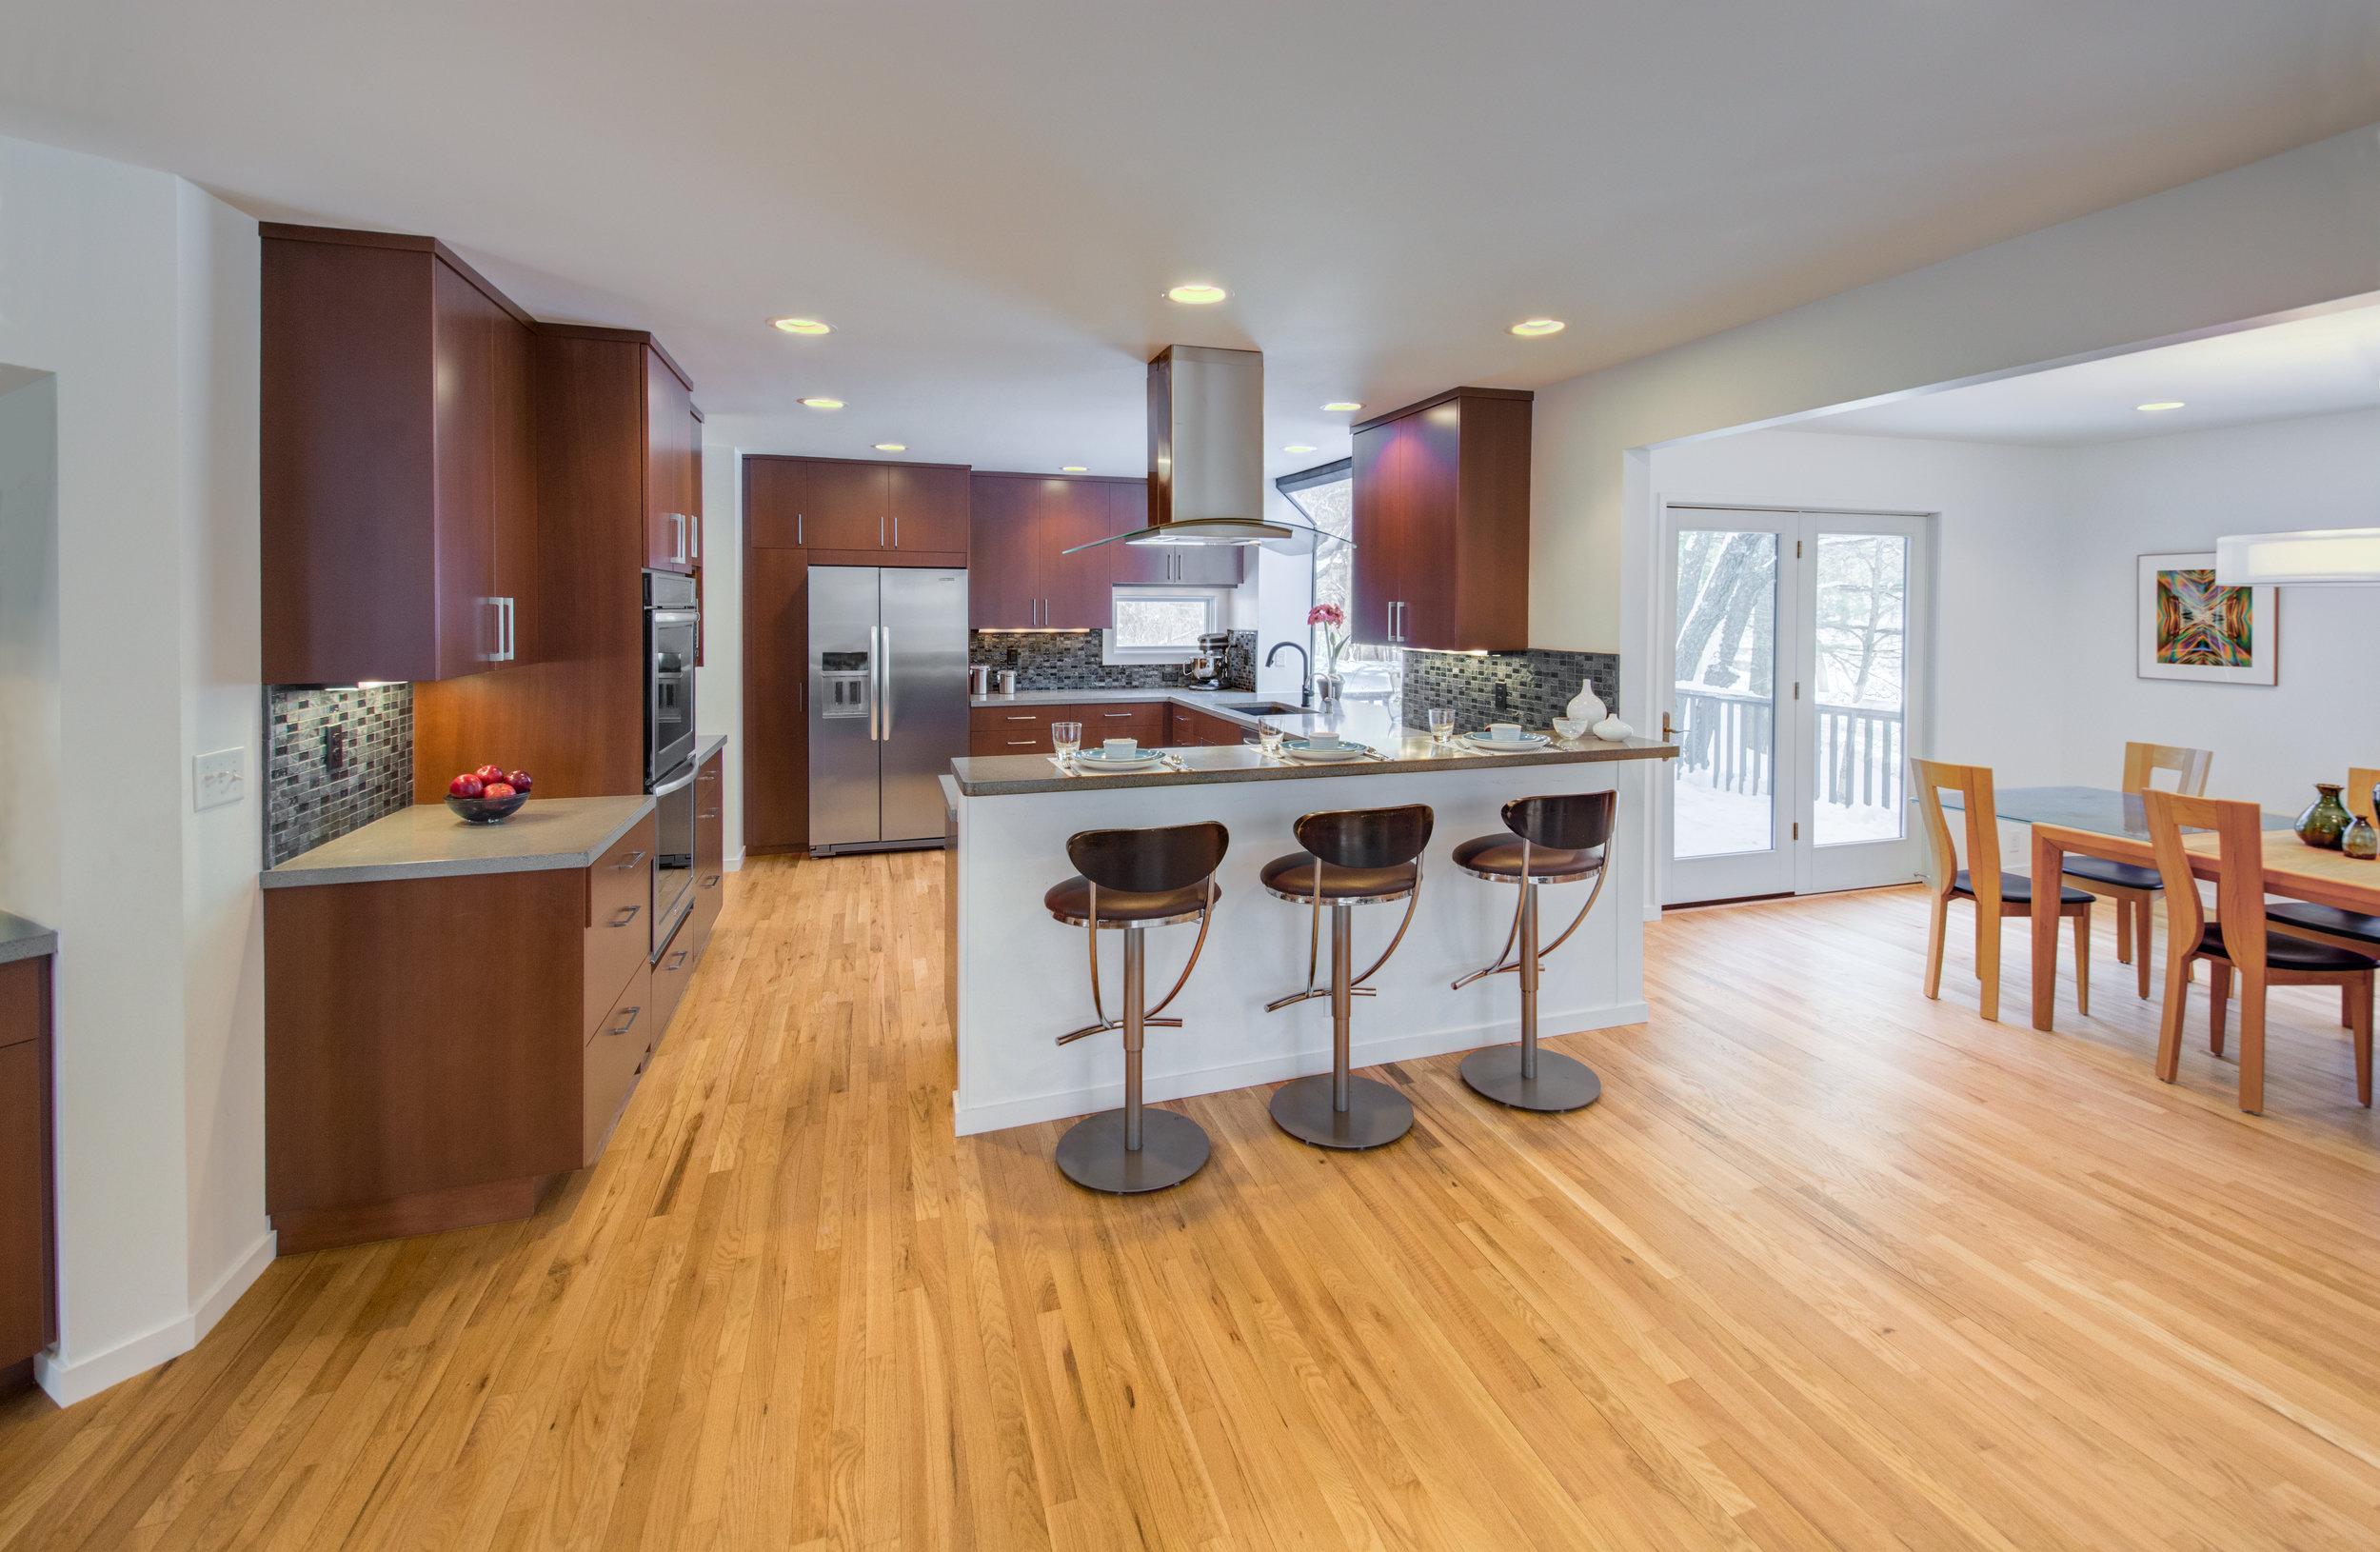 Major Home Renovation & Addition: Gallup Park